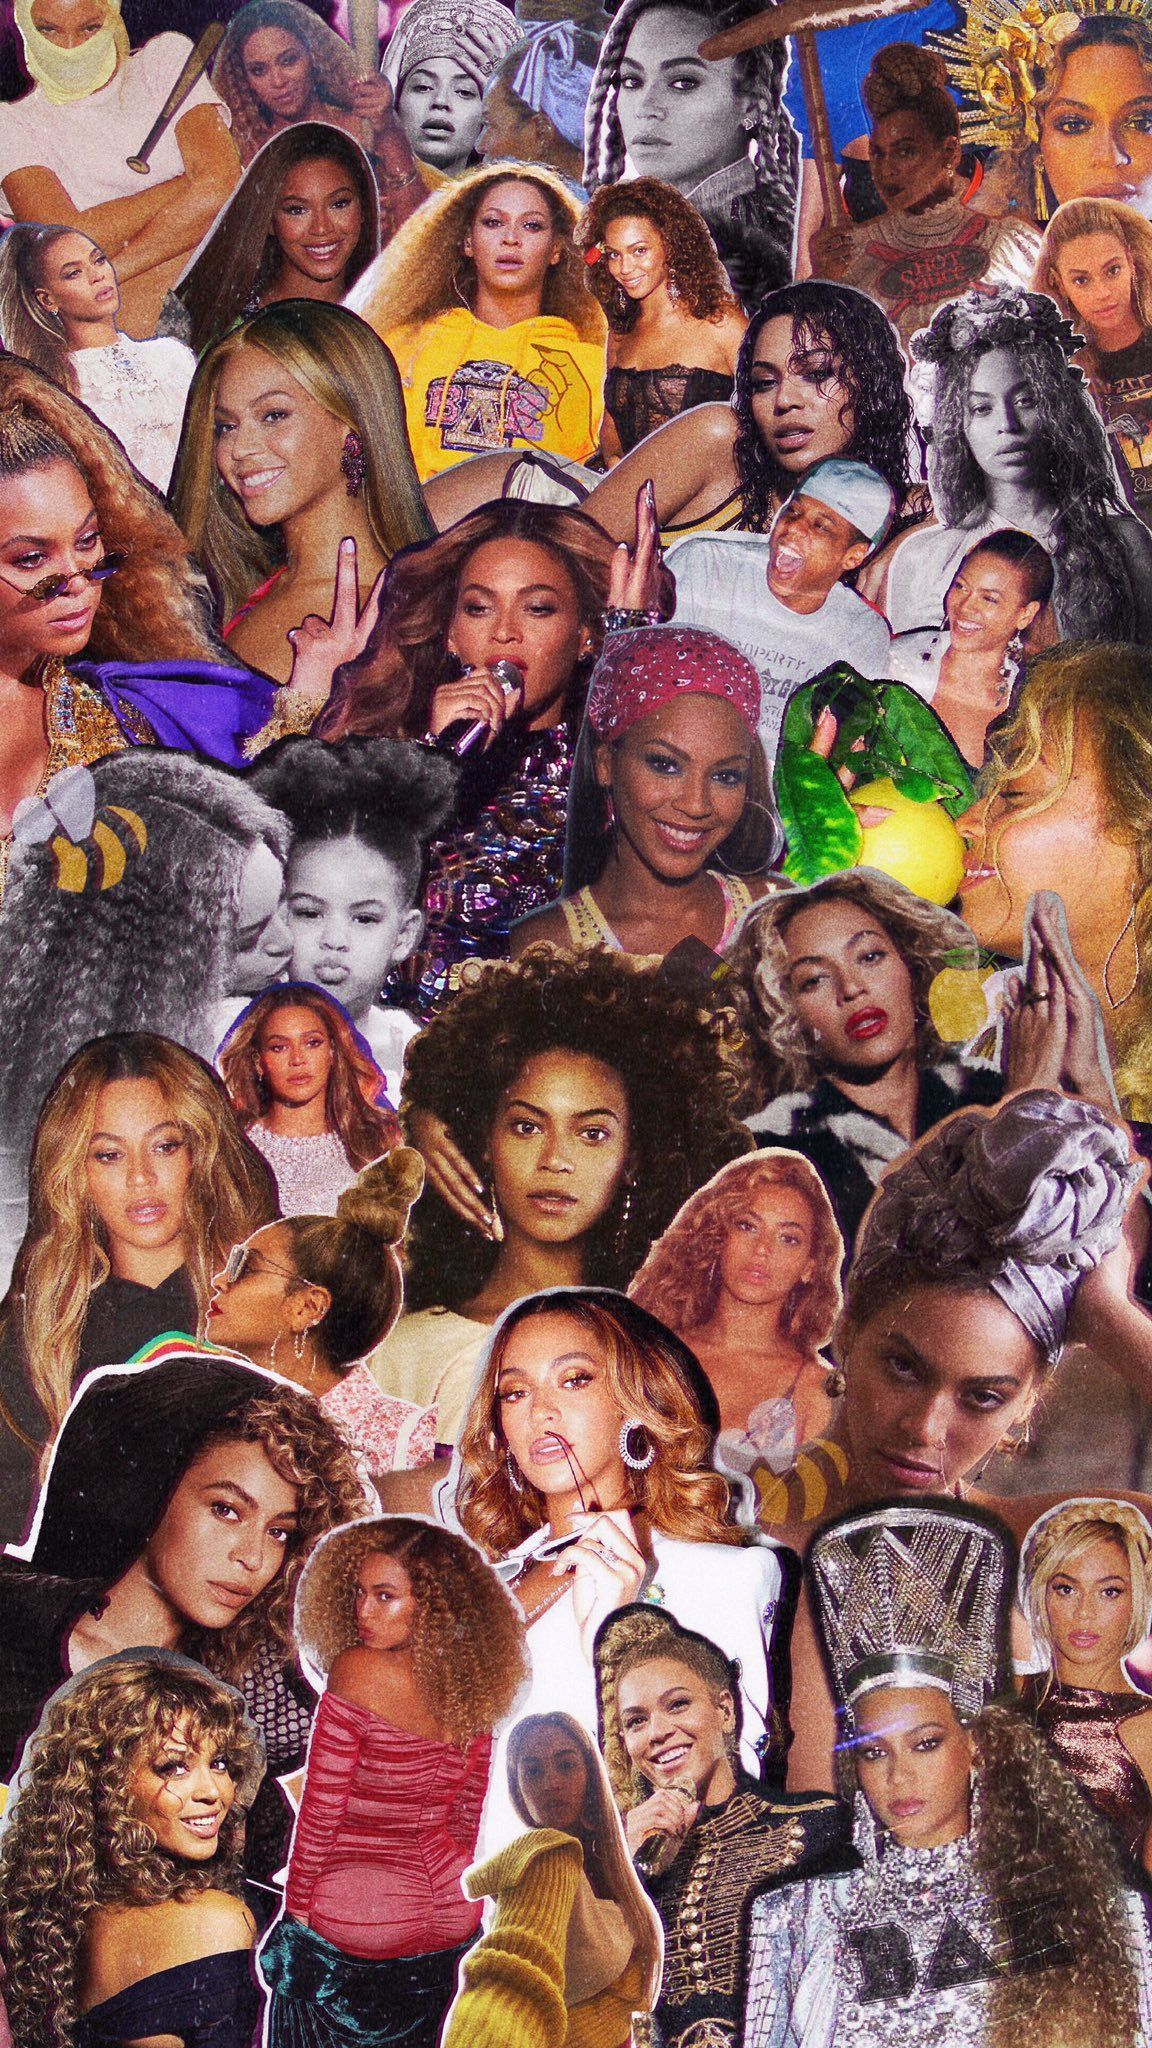 Aesthetic Rap 90s Wallpapers - Wallpaper Cave